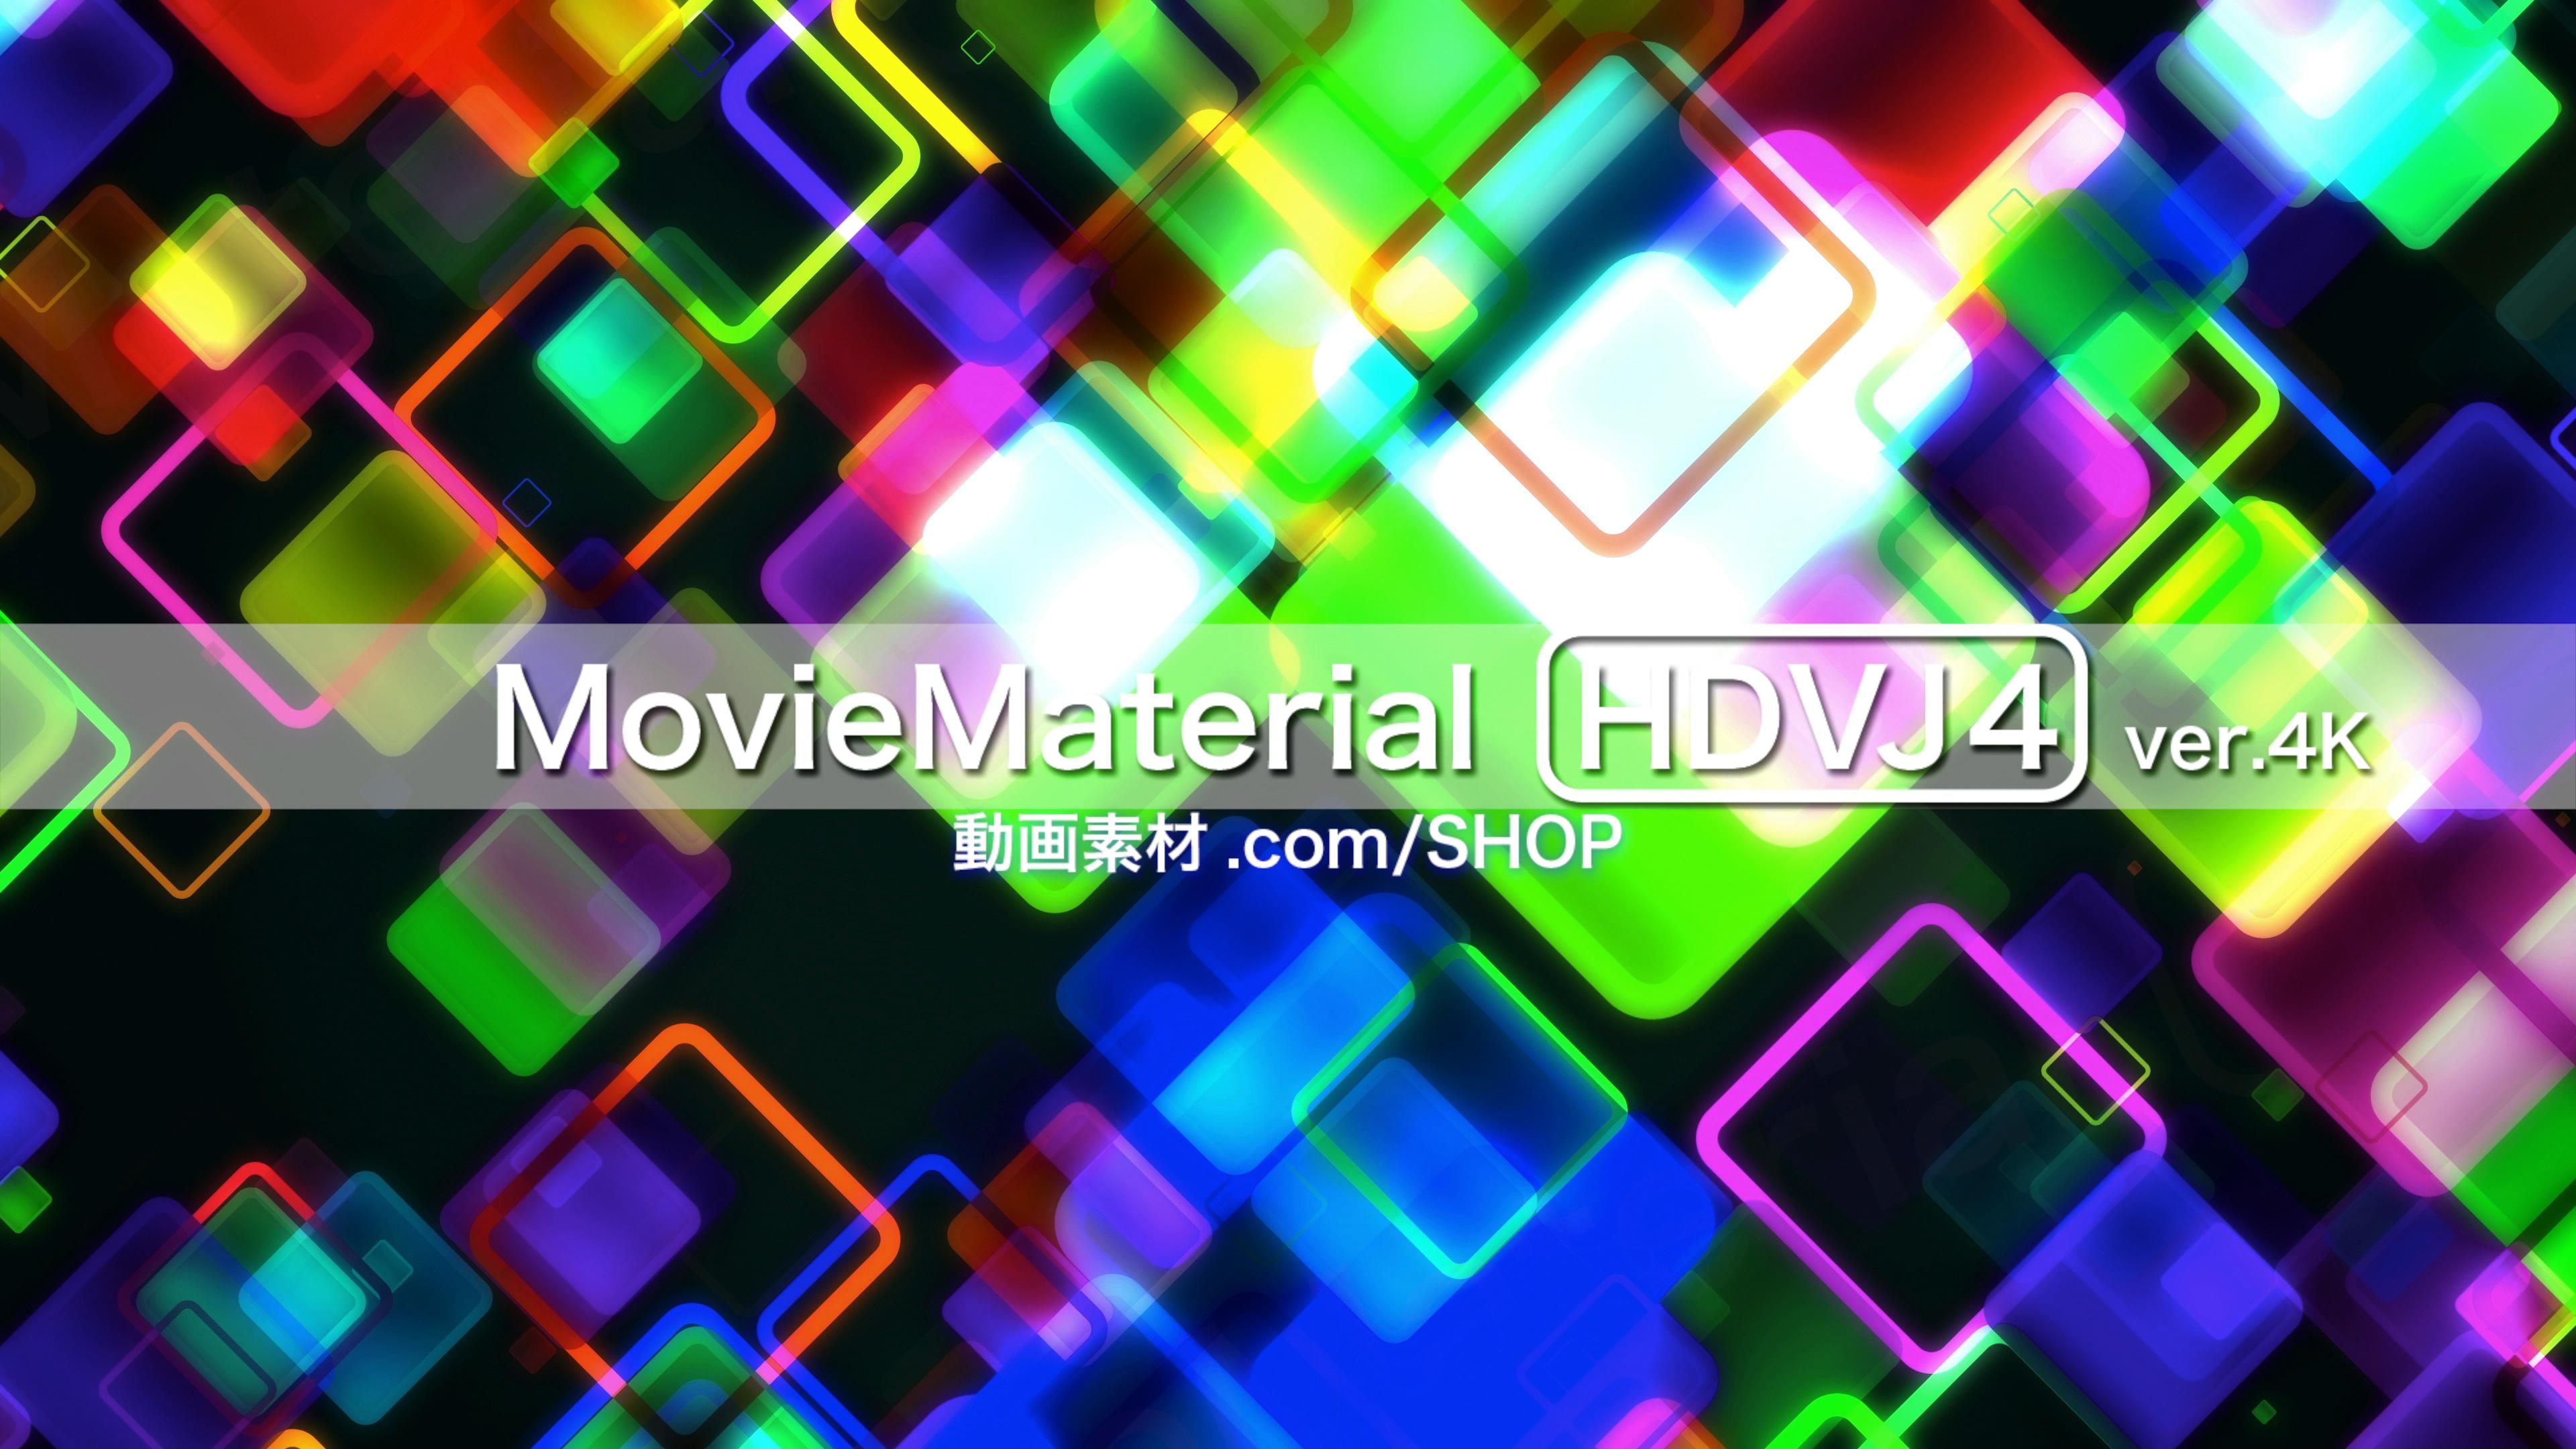 4K2Kループ動画素材集第4段【MovieMaterial HDVJ4 ver.4K】ロイヤリティフリー(著作権使用料無料)6